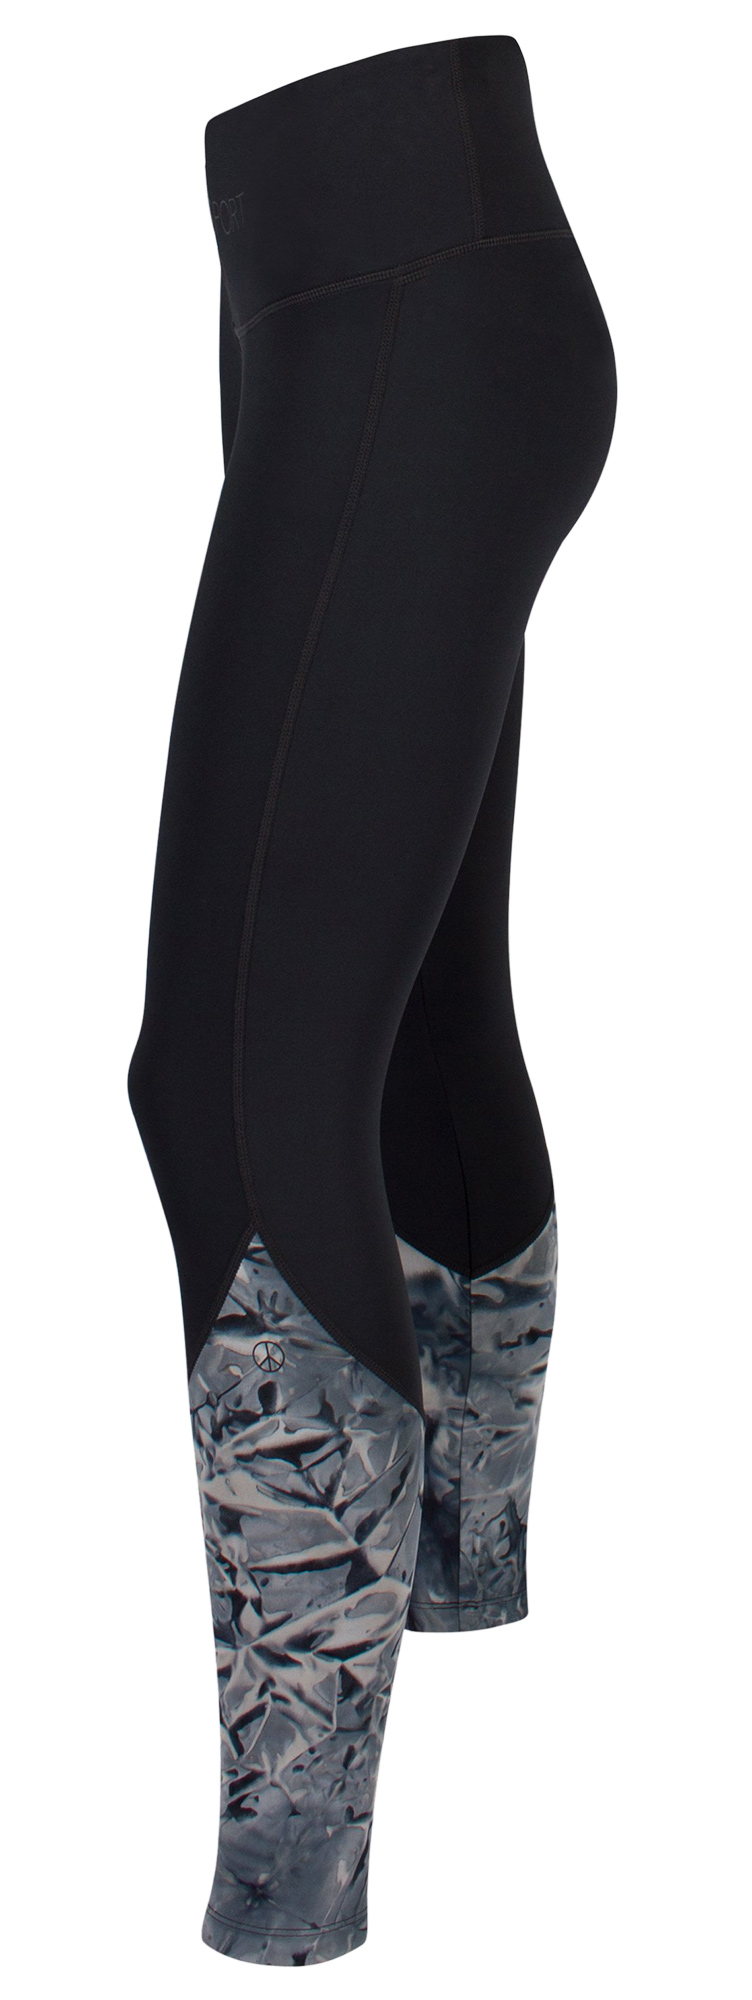 "Function-Leggings ""Colourblock tie dye"" - black/navy"